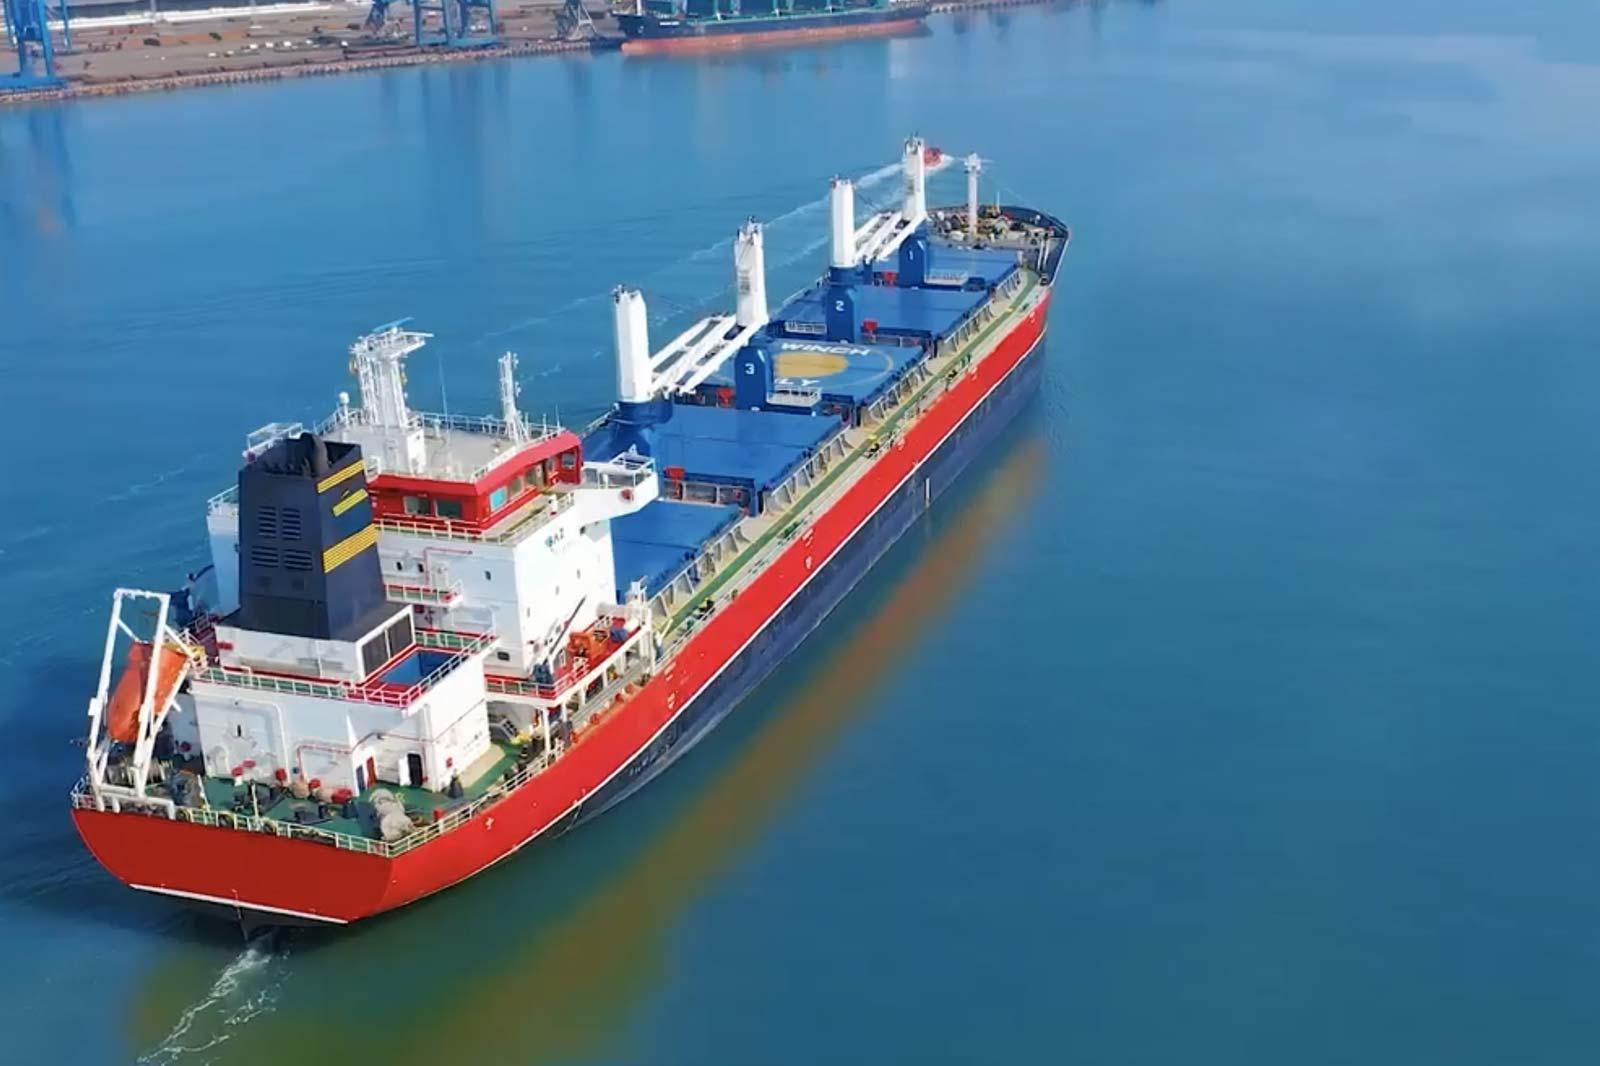 Ceekay ship